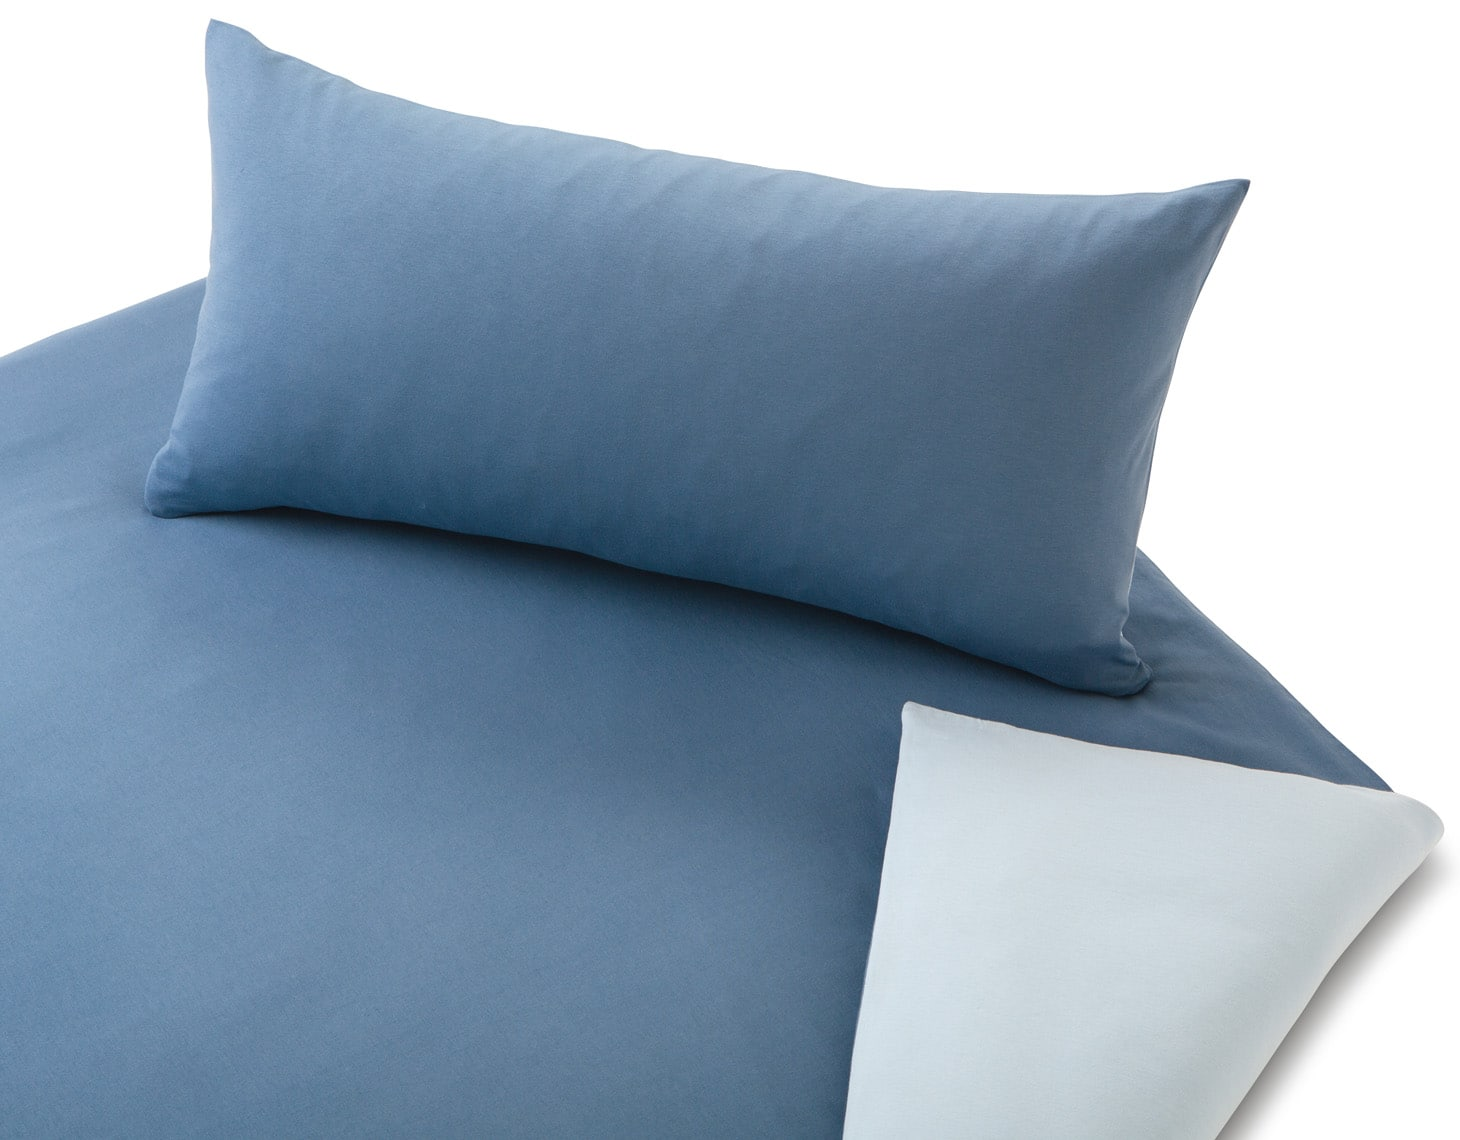 wendebettw sche jersey biom bel bonn. Black Bedroom Furniture Sets. Home Design Ideas